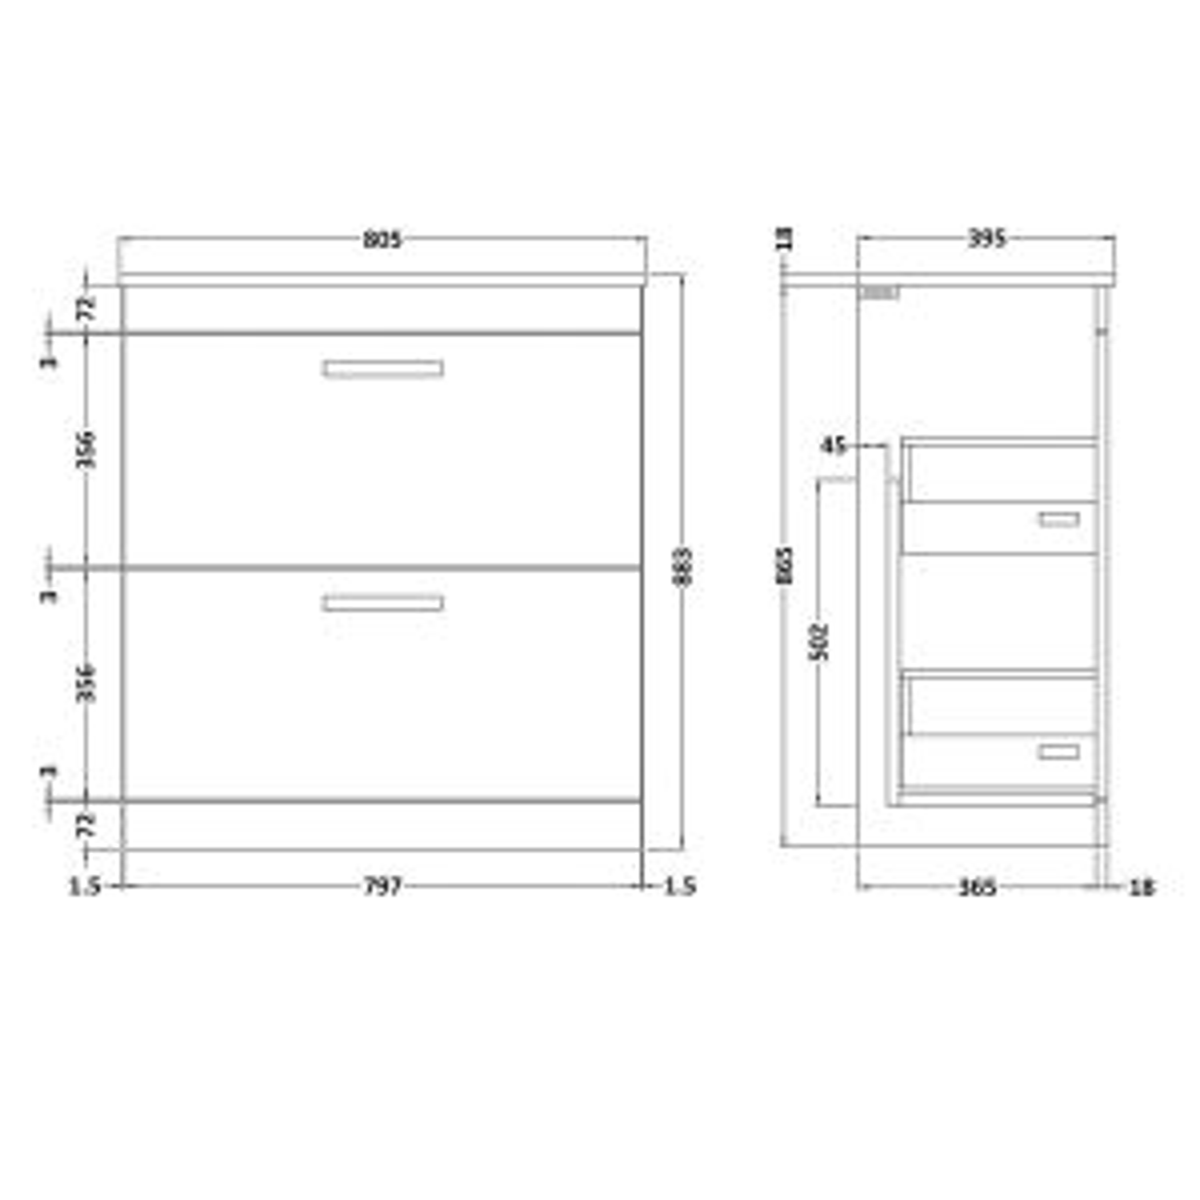 Nuie Athena Hacienda Black 2 Drawer Floor Standing Vanity Unit with 18mm Profile Basin 800mm Line Drawing